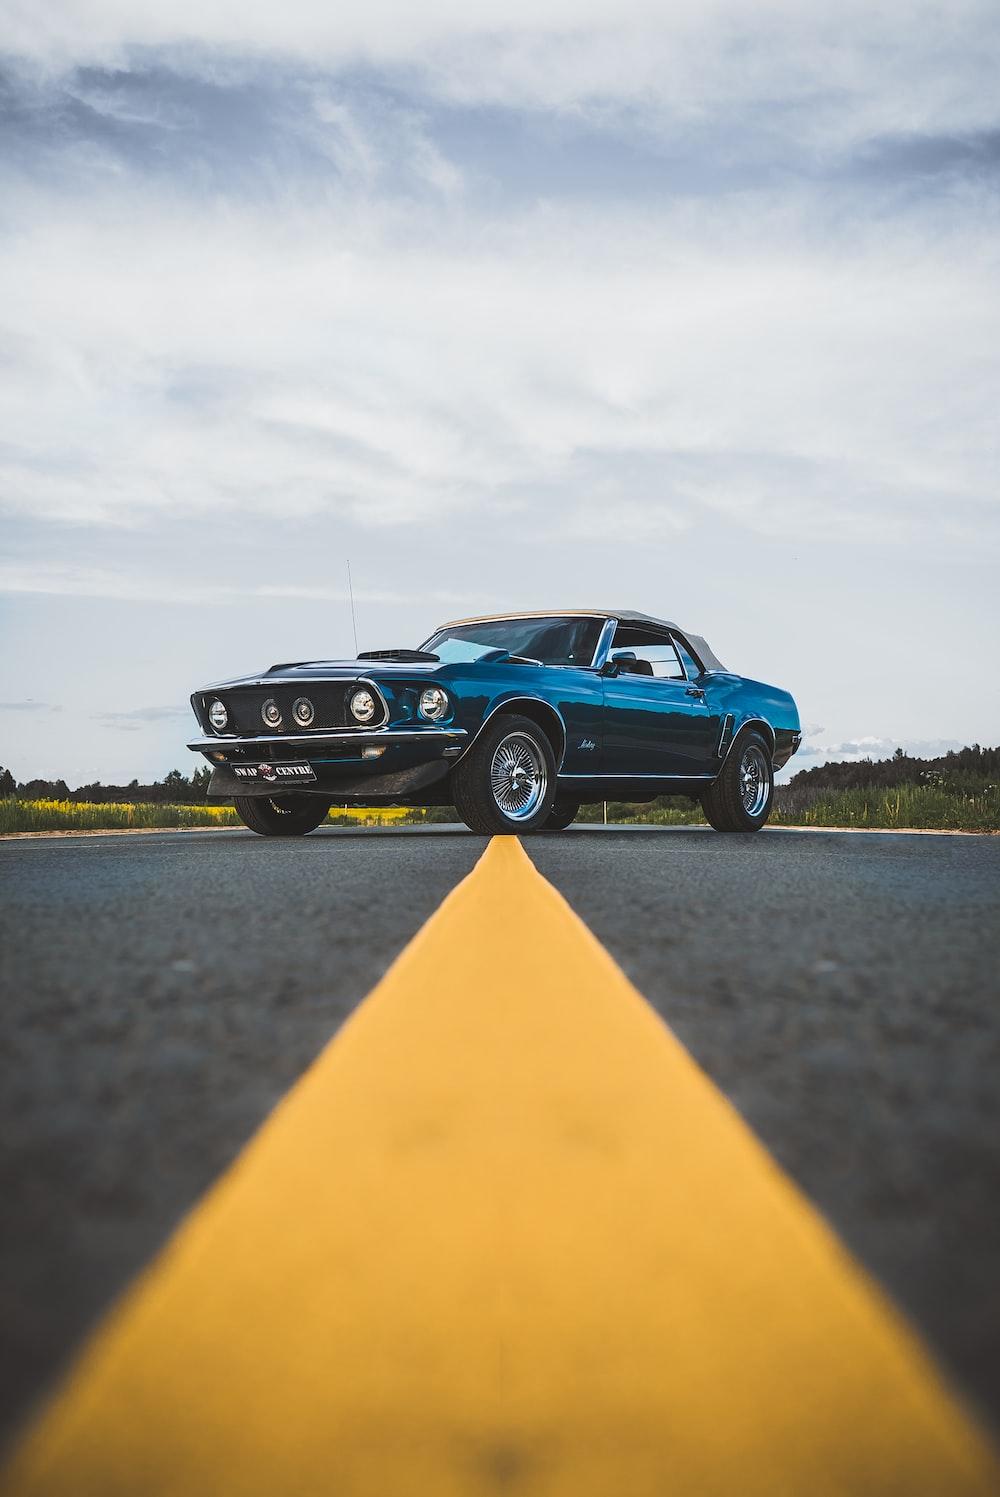 blue chevrolet camaro on road during daytime